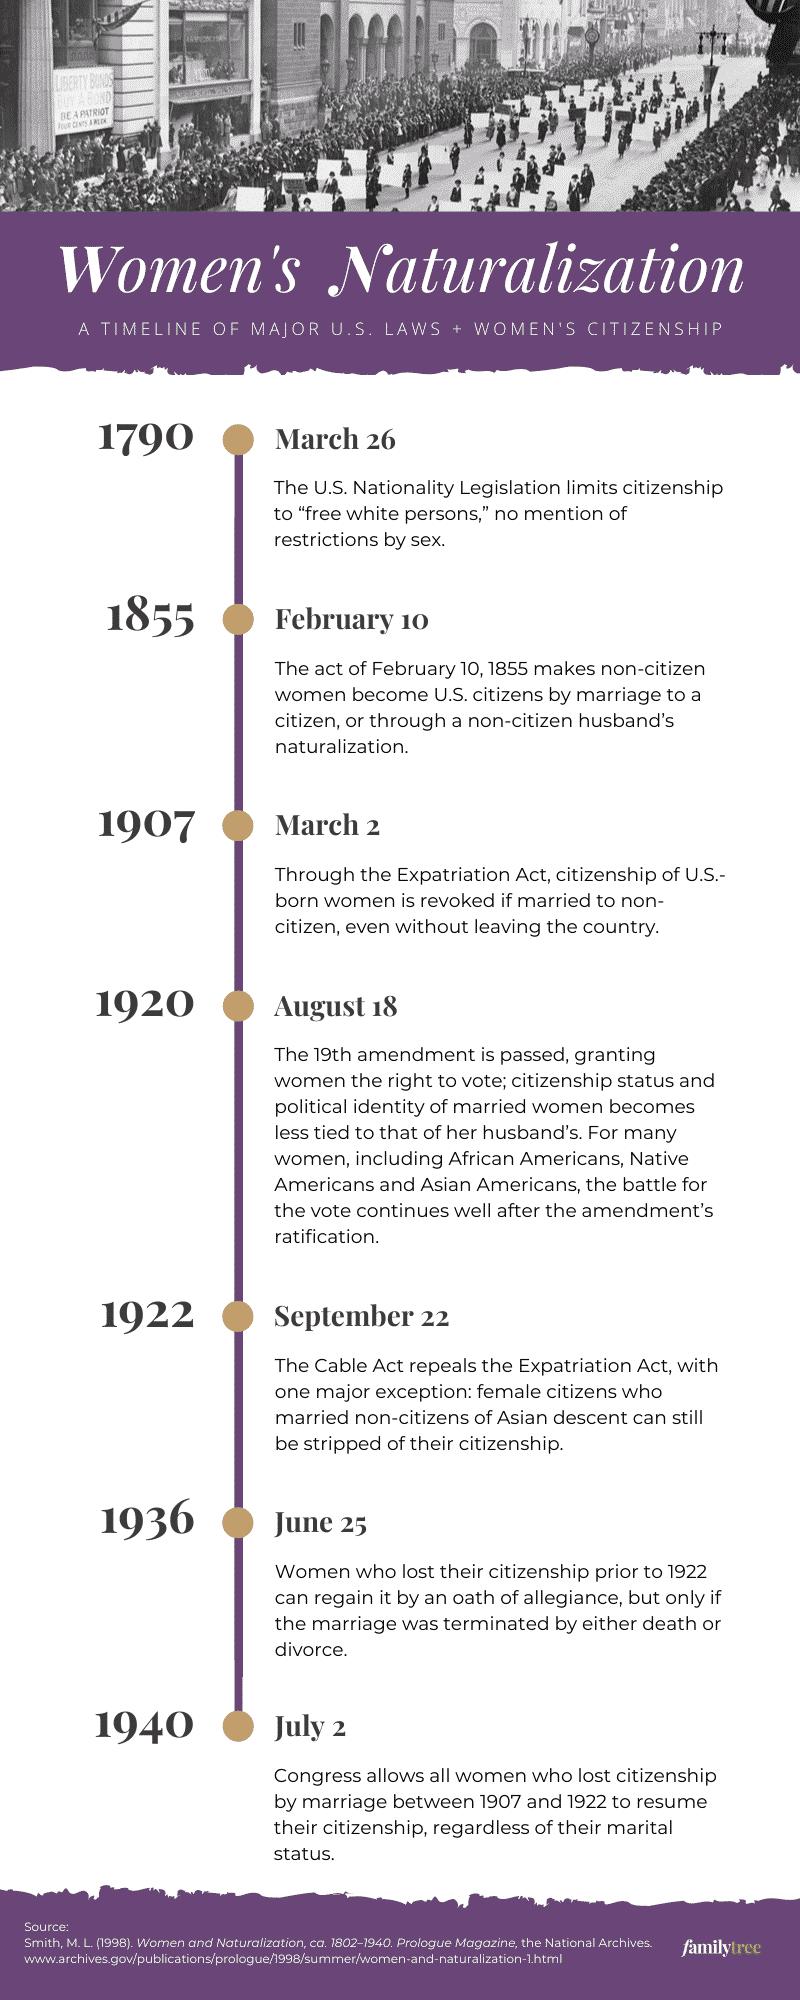 Women's Naturalization Timeline